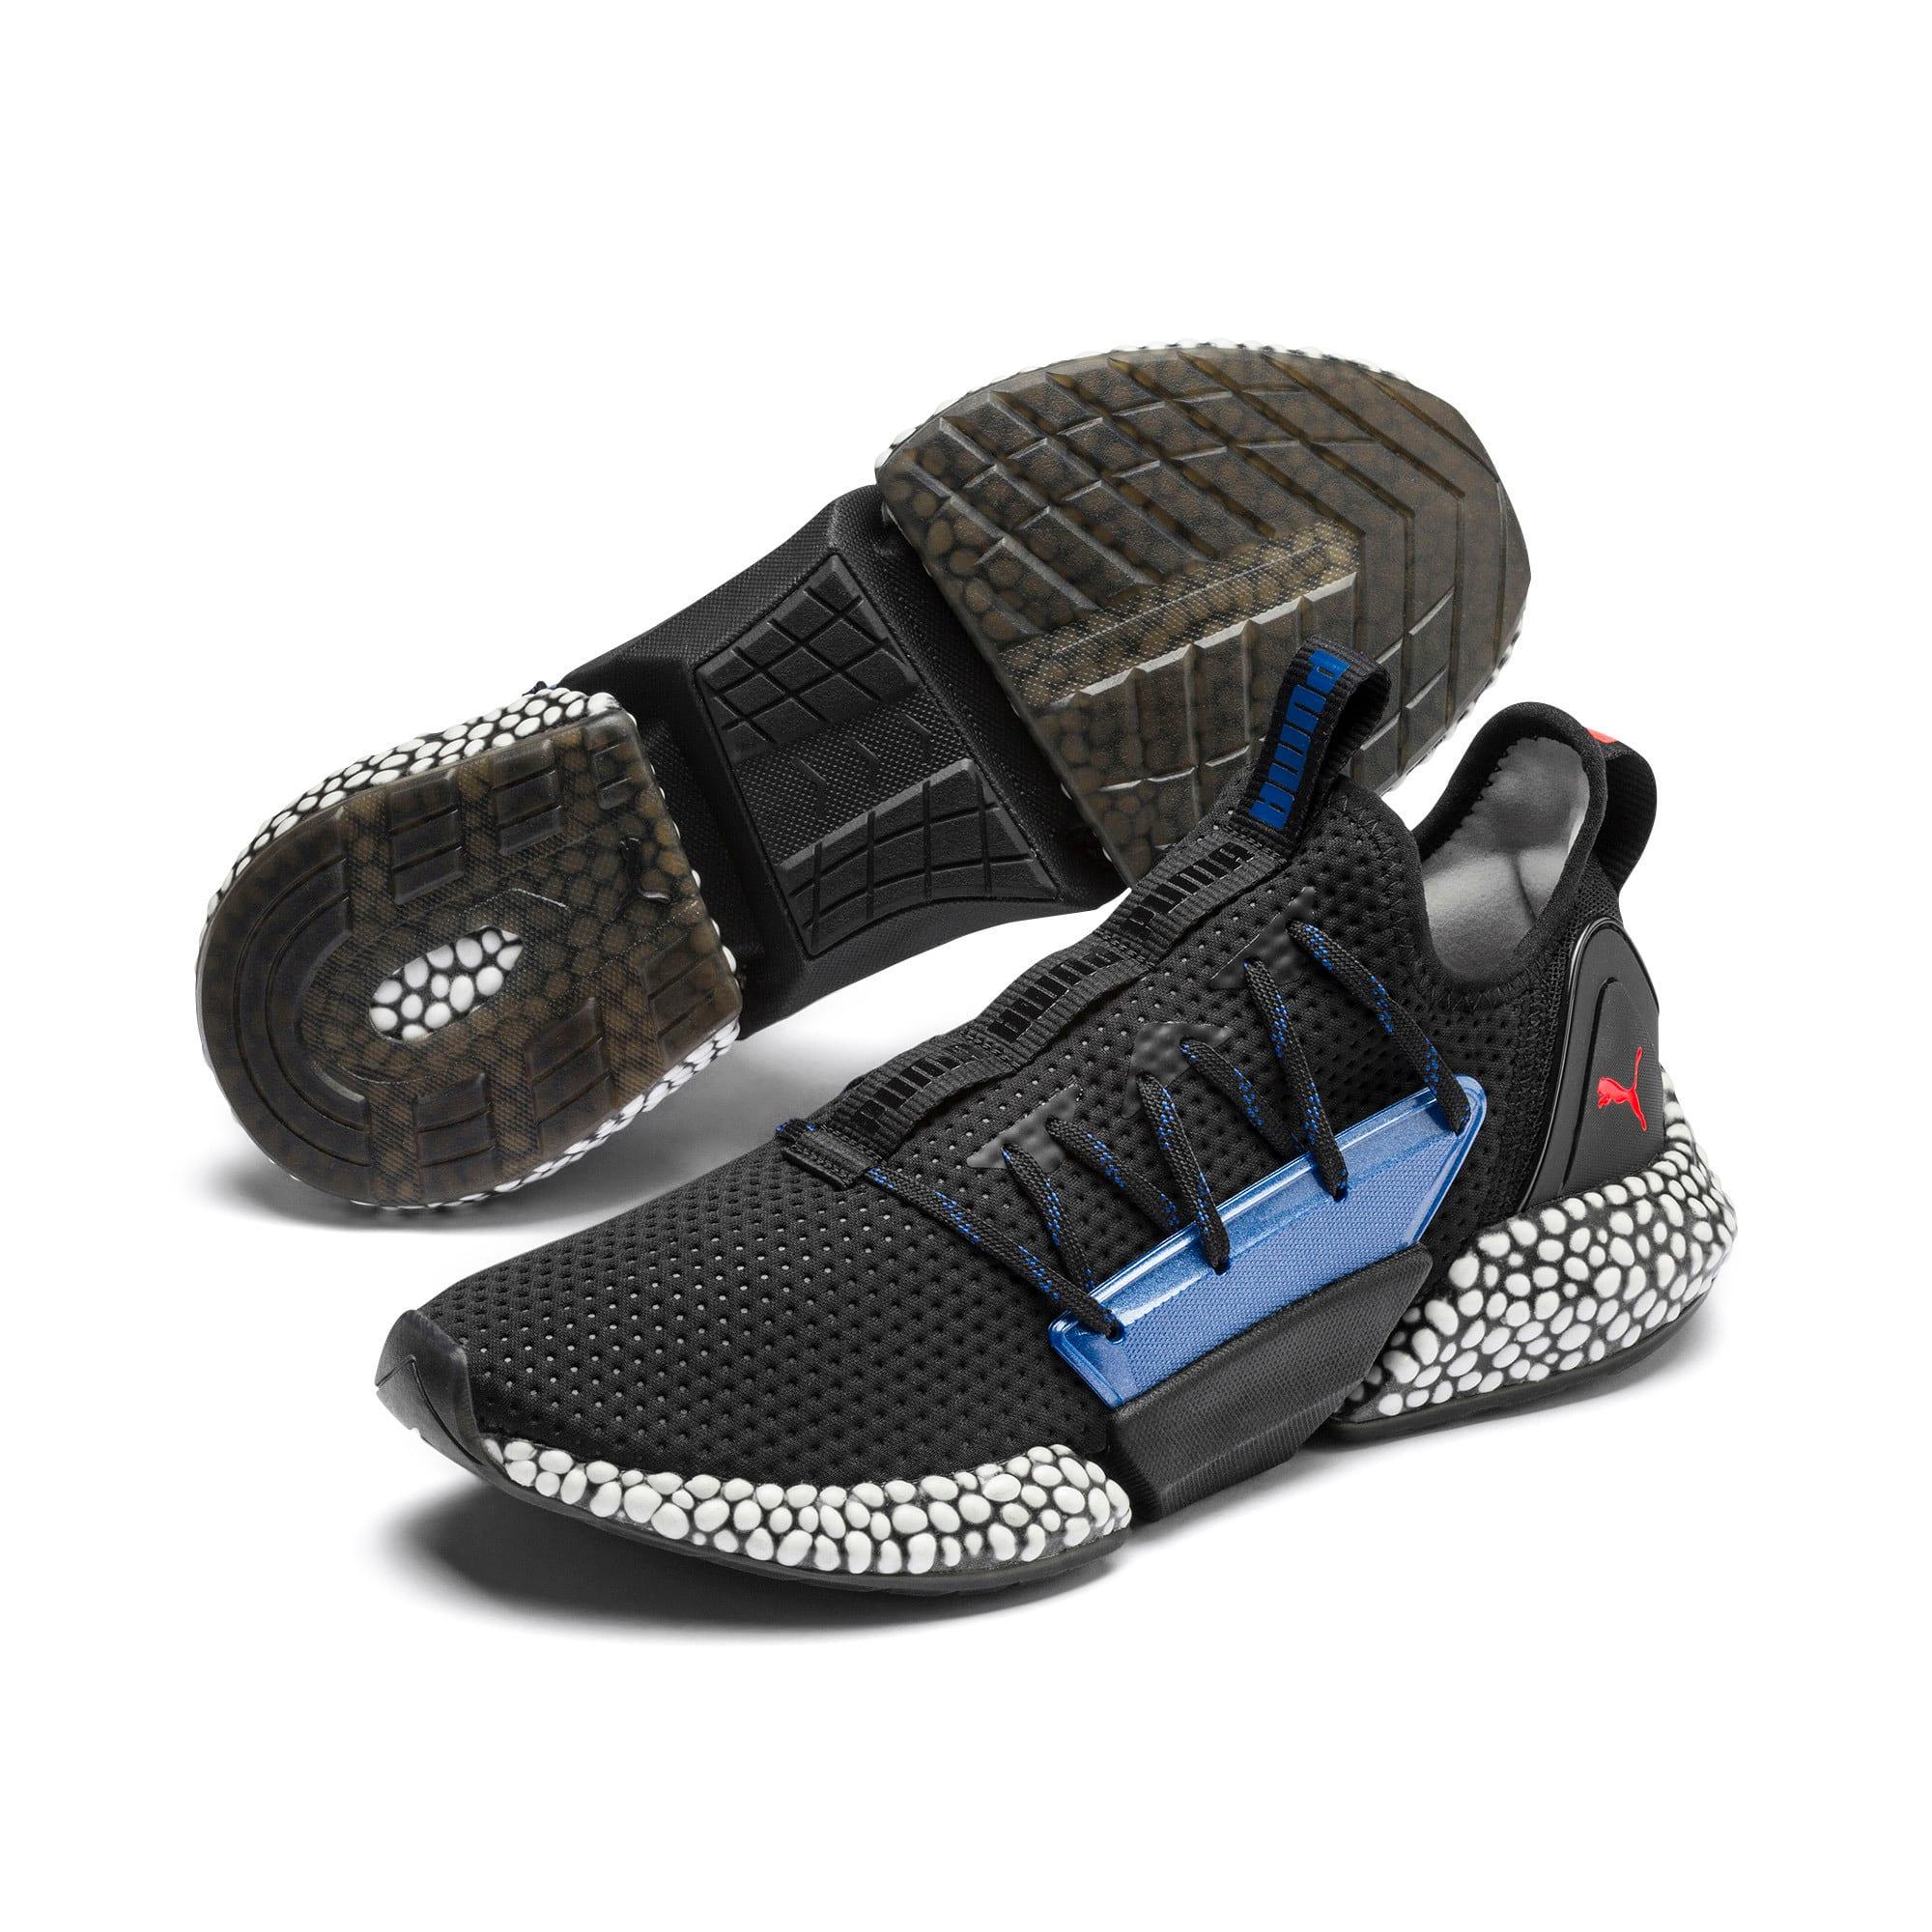 Thumbnail 3 of HYBRID Rocket Aero Men's Running Shoes, Puma Black-Galaxy Blue, medium